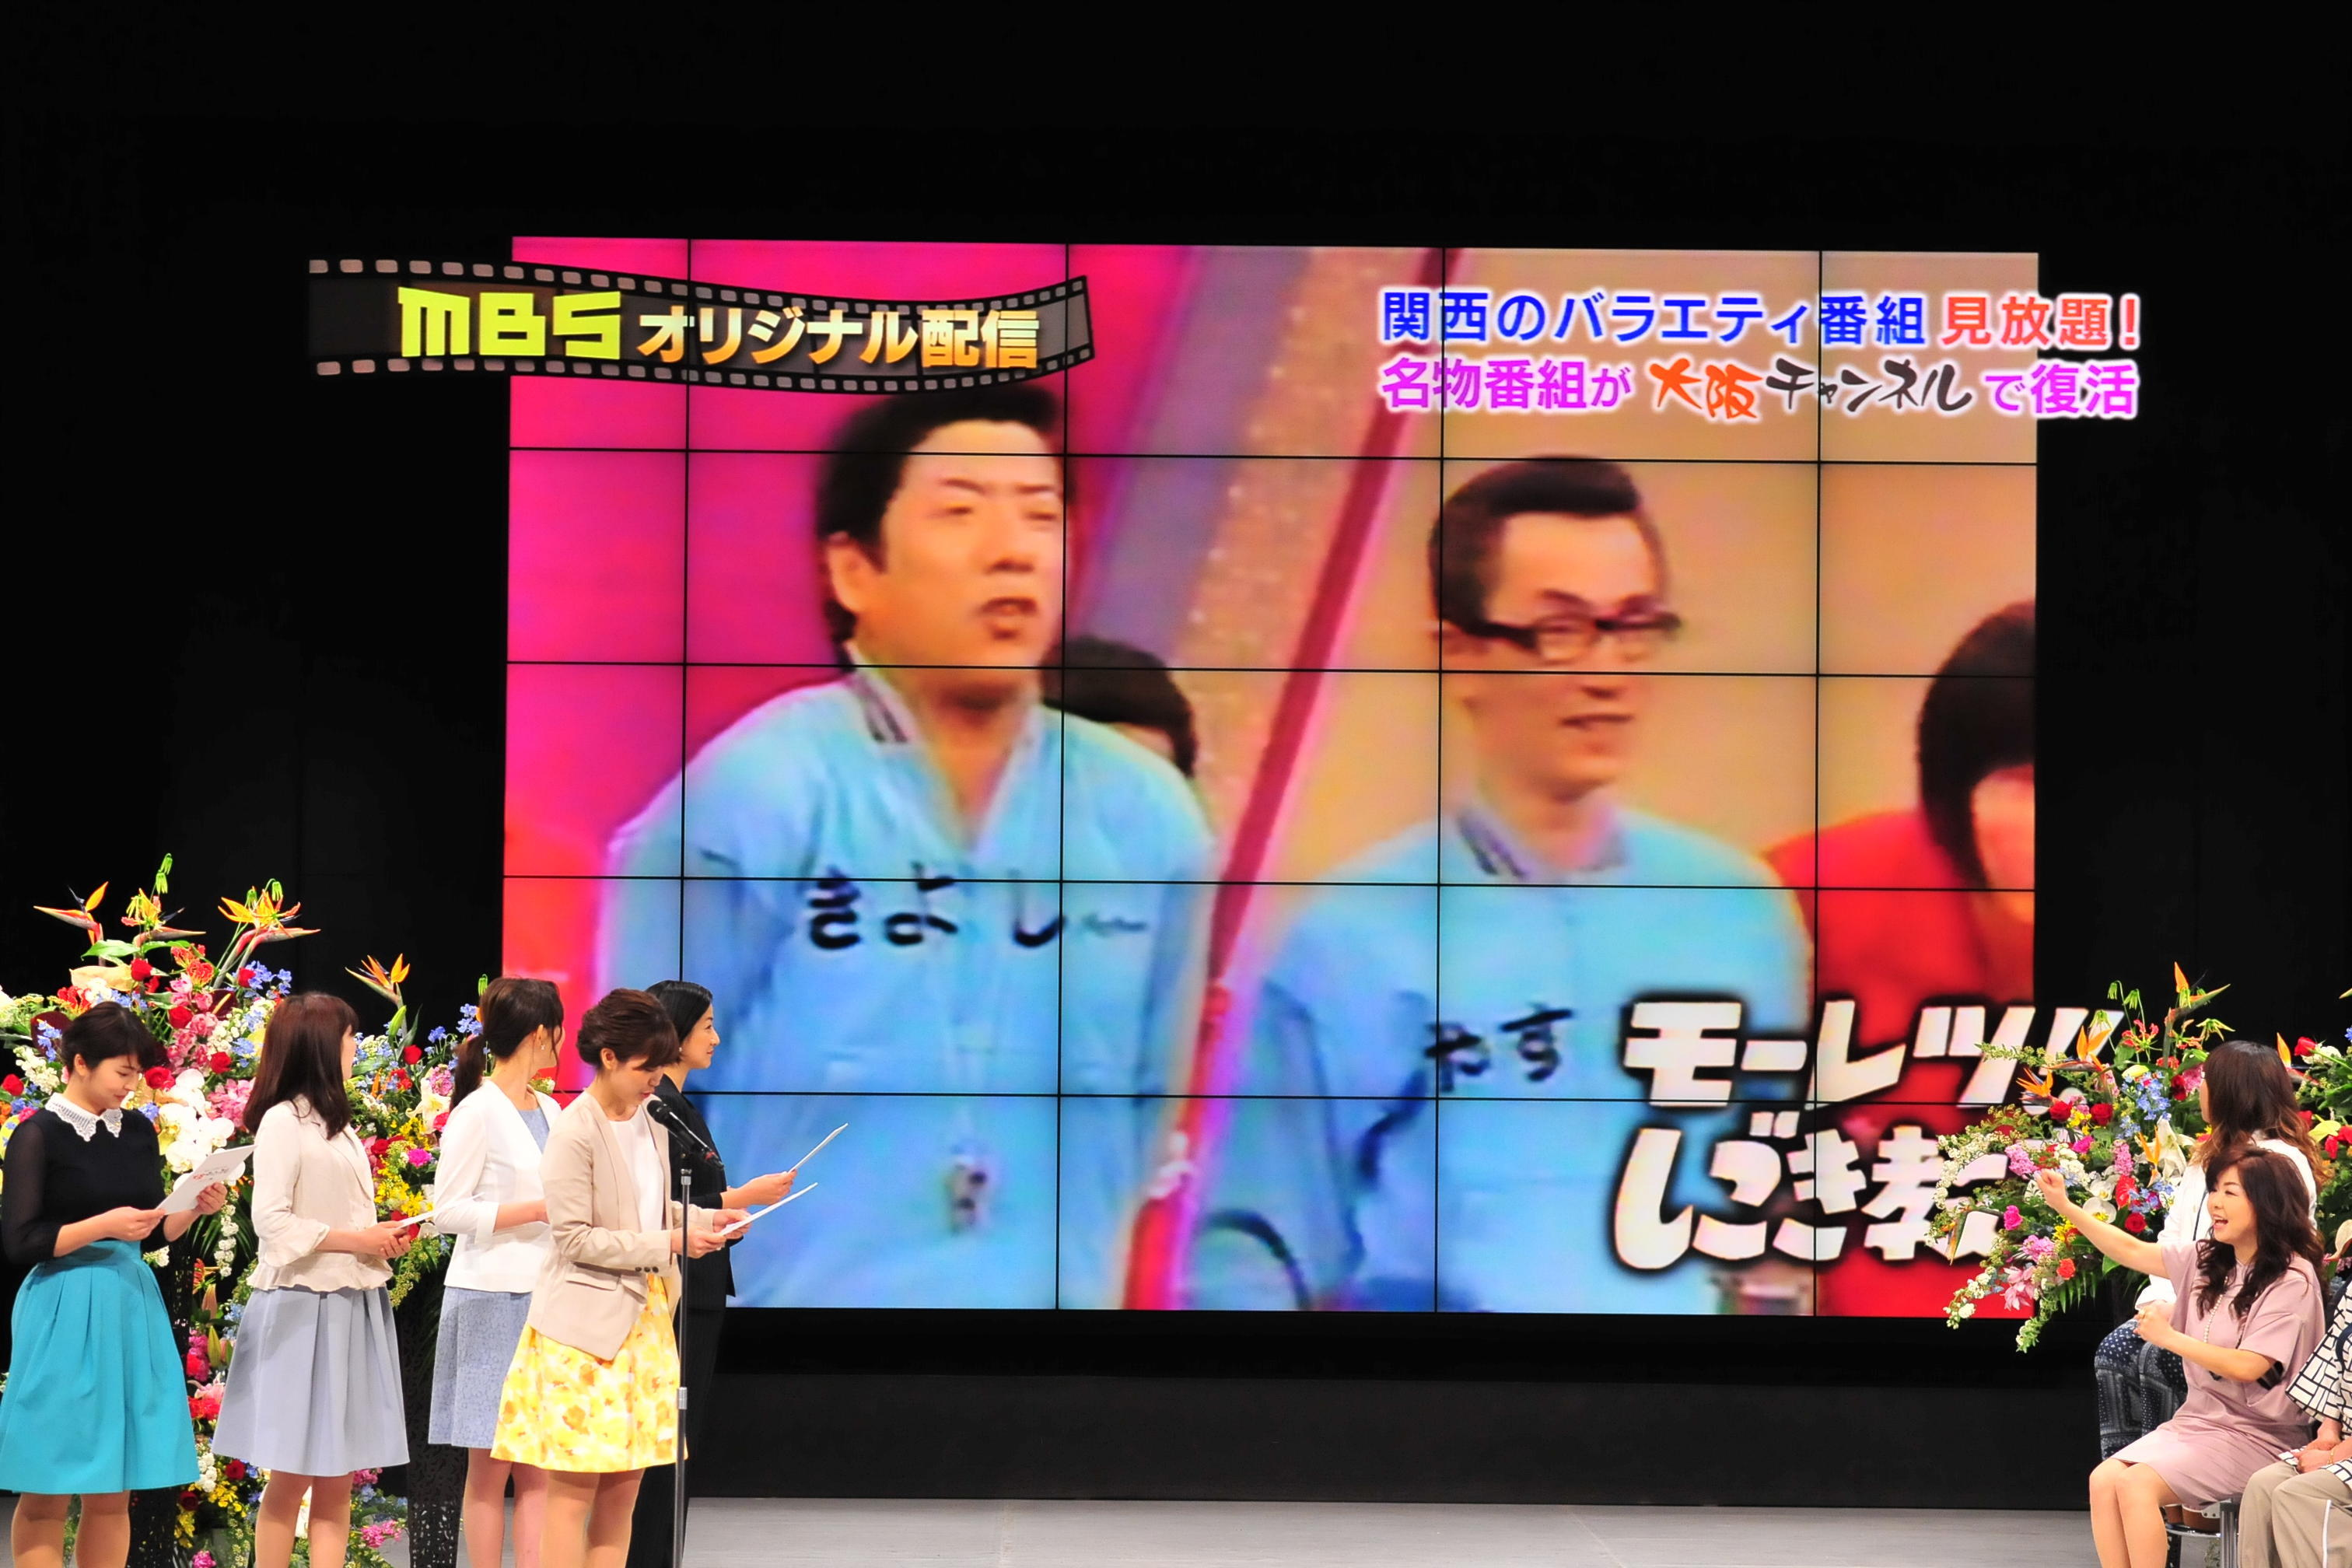 http://news.yoshimoto.co.jp/20170425160411-87cc5295f05b211cab87a282afb331ab4bab40bc.jpg